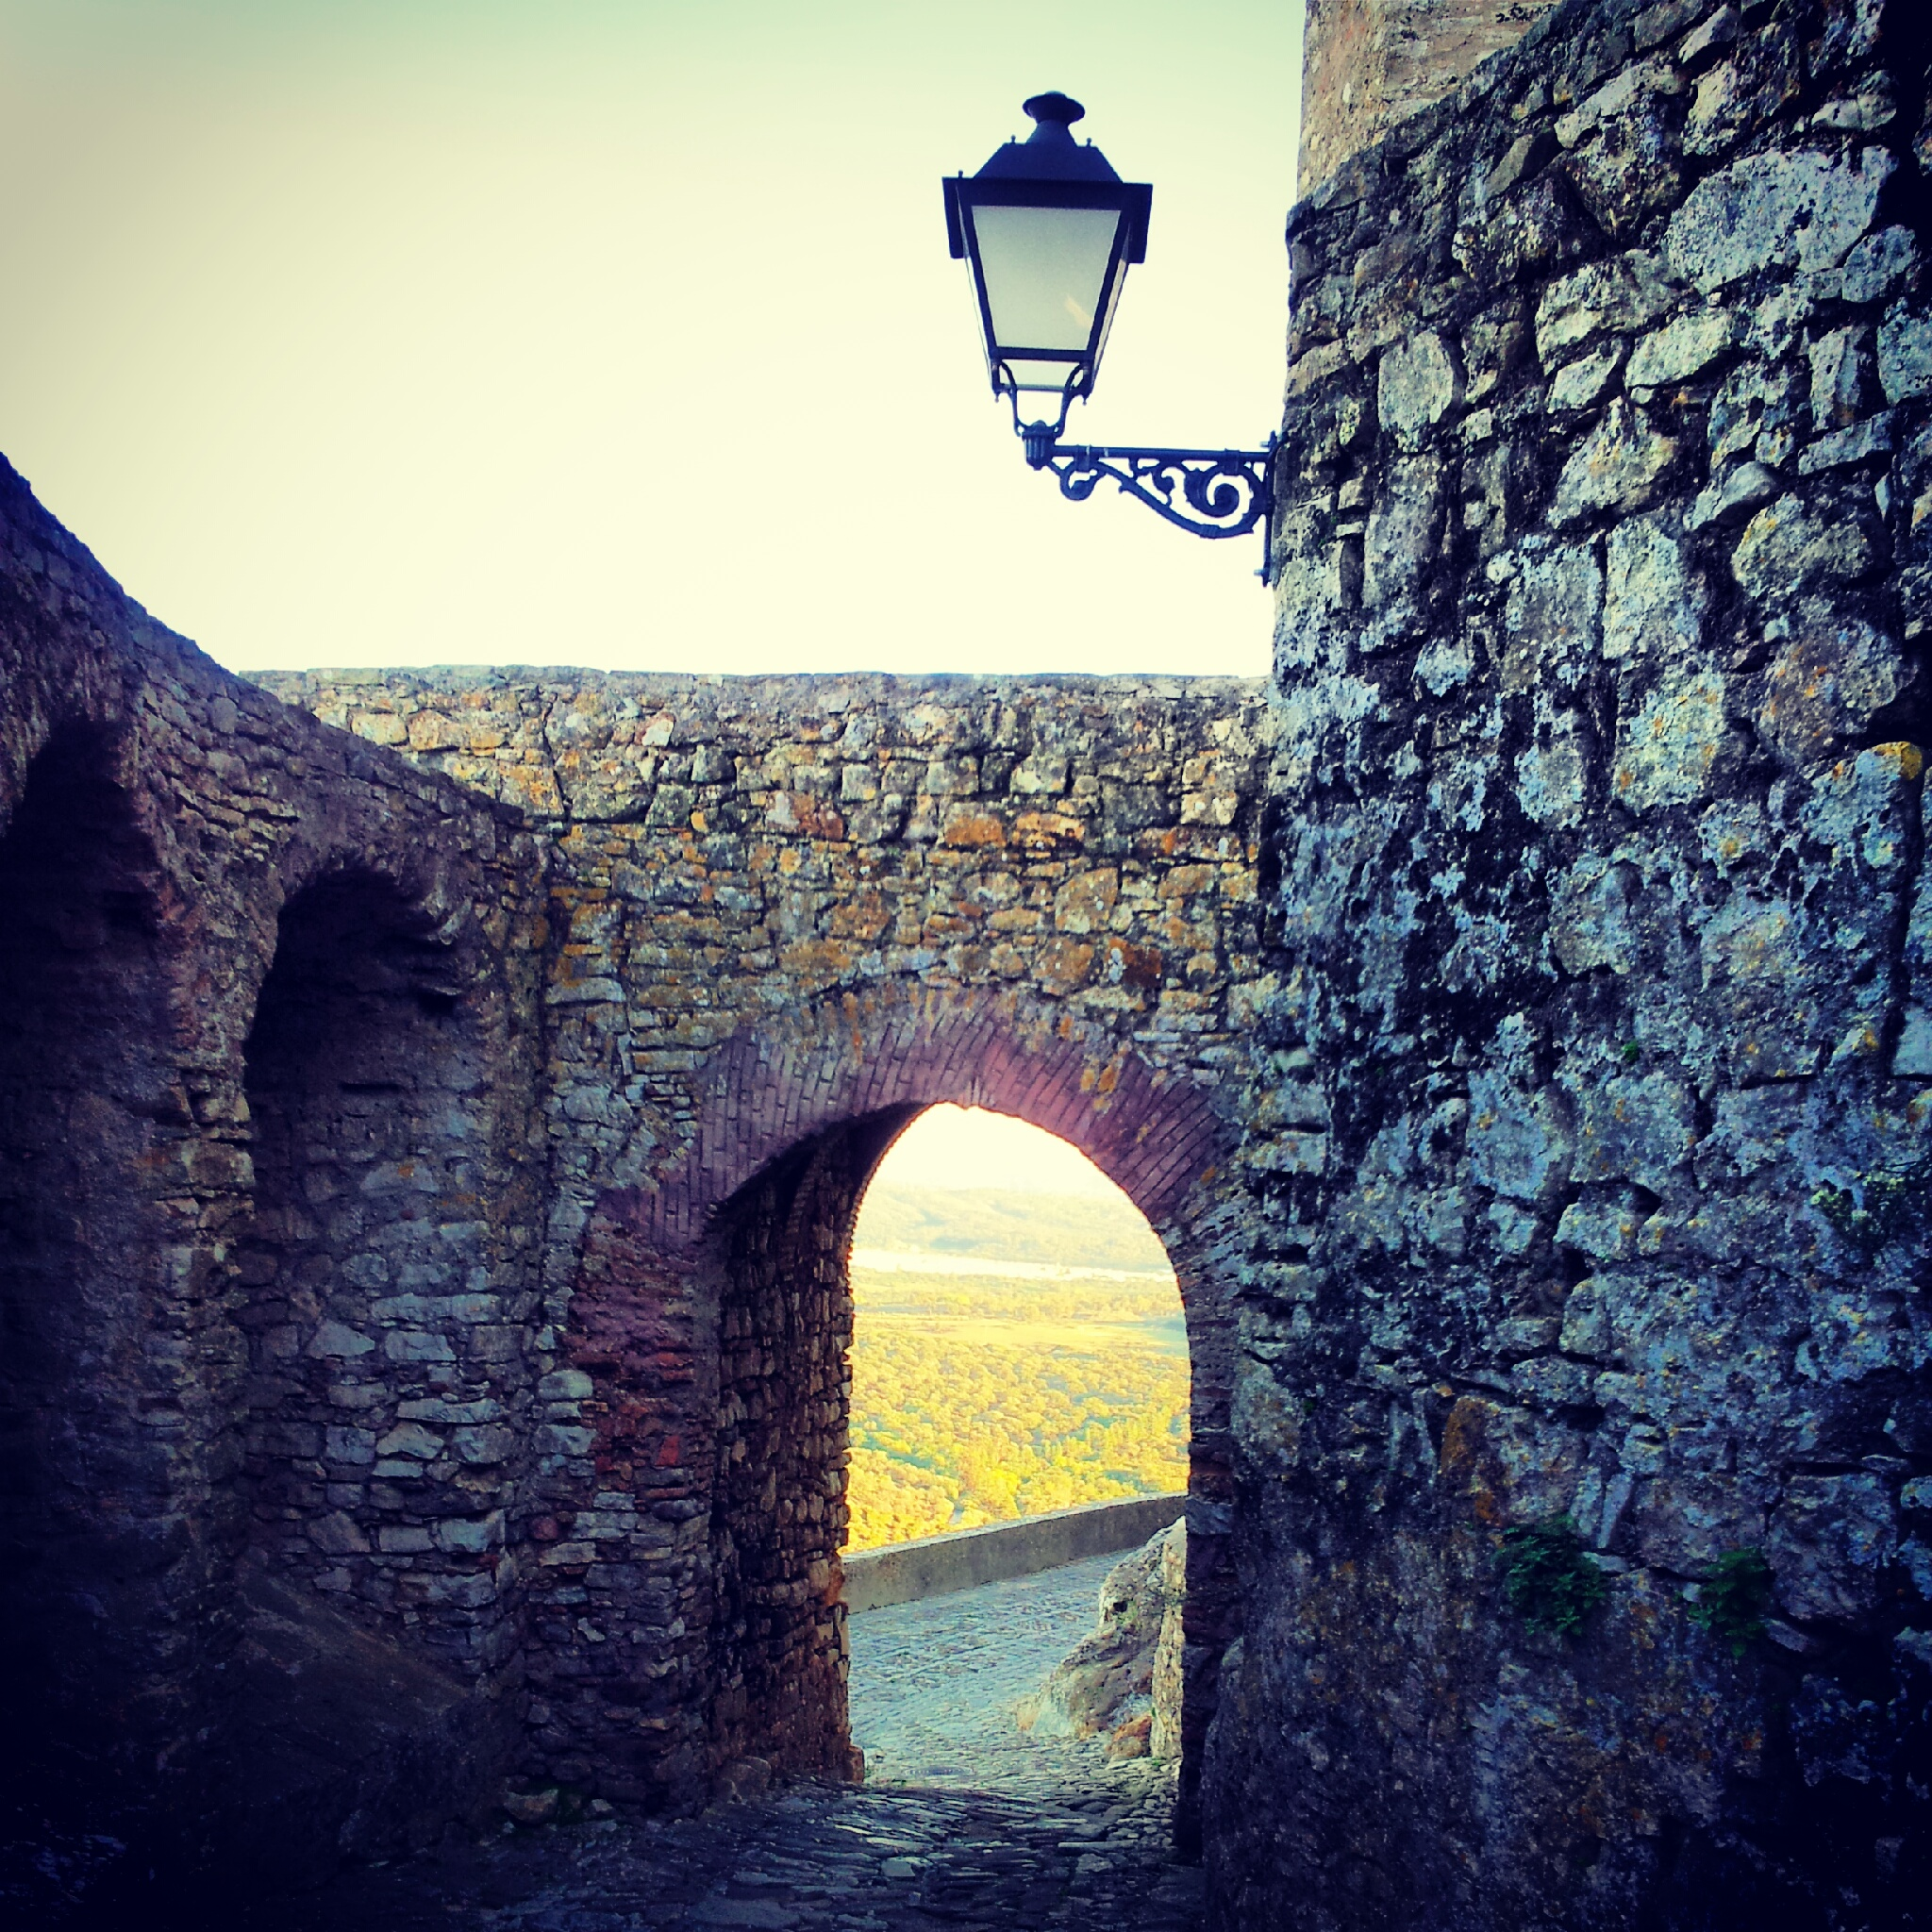 Castellar de la Frontera, provincia de Cádiz